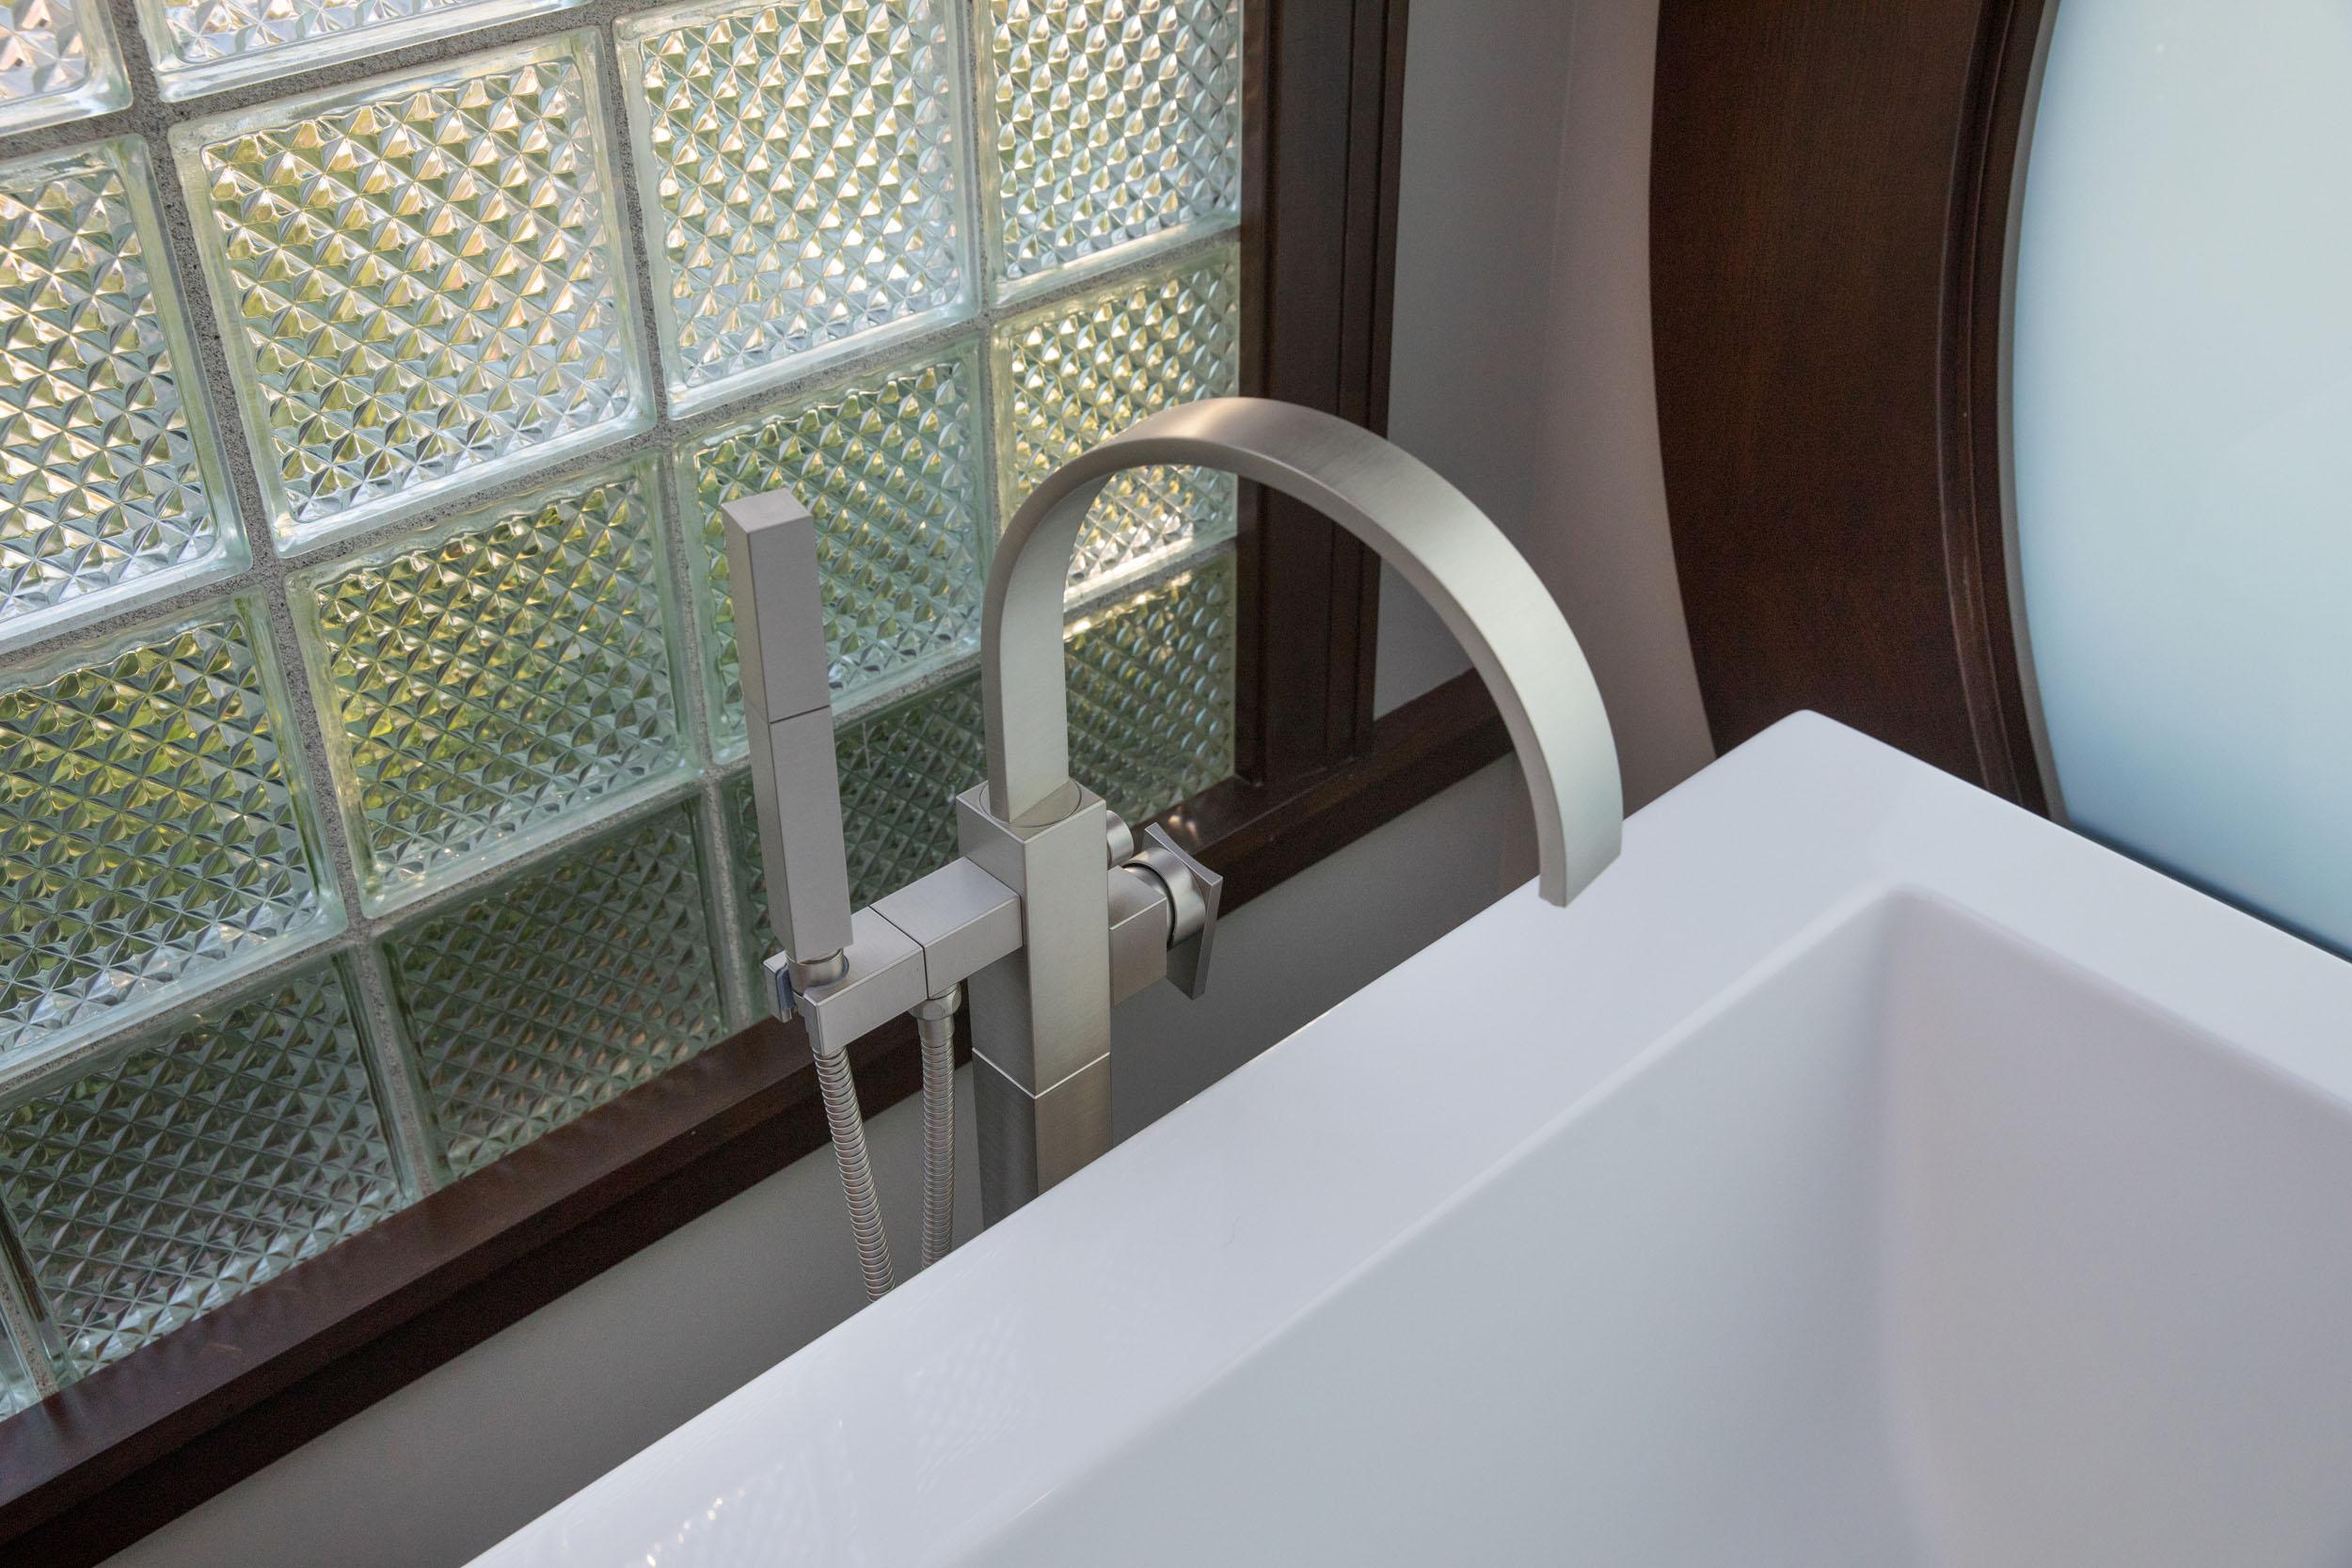 Tub-Faucet